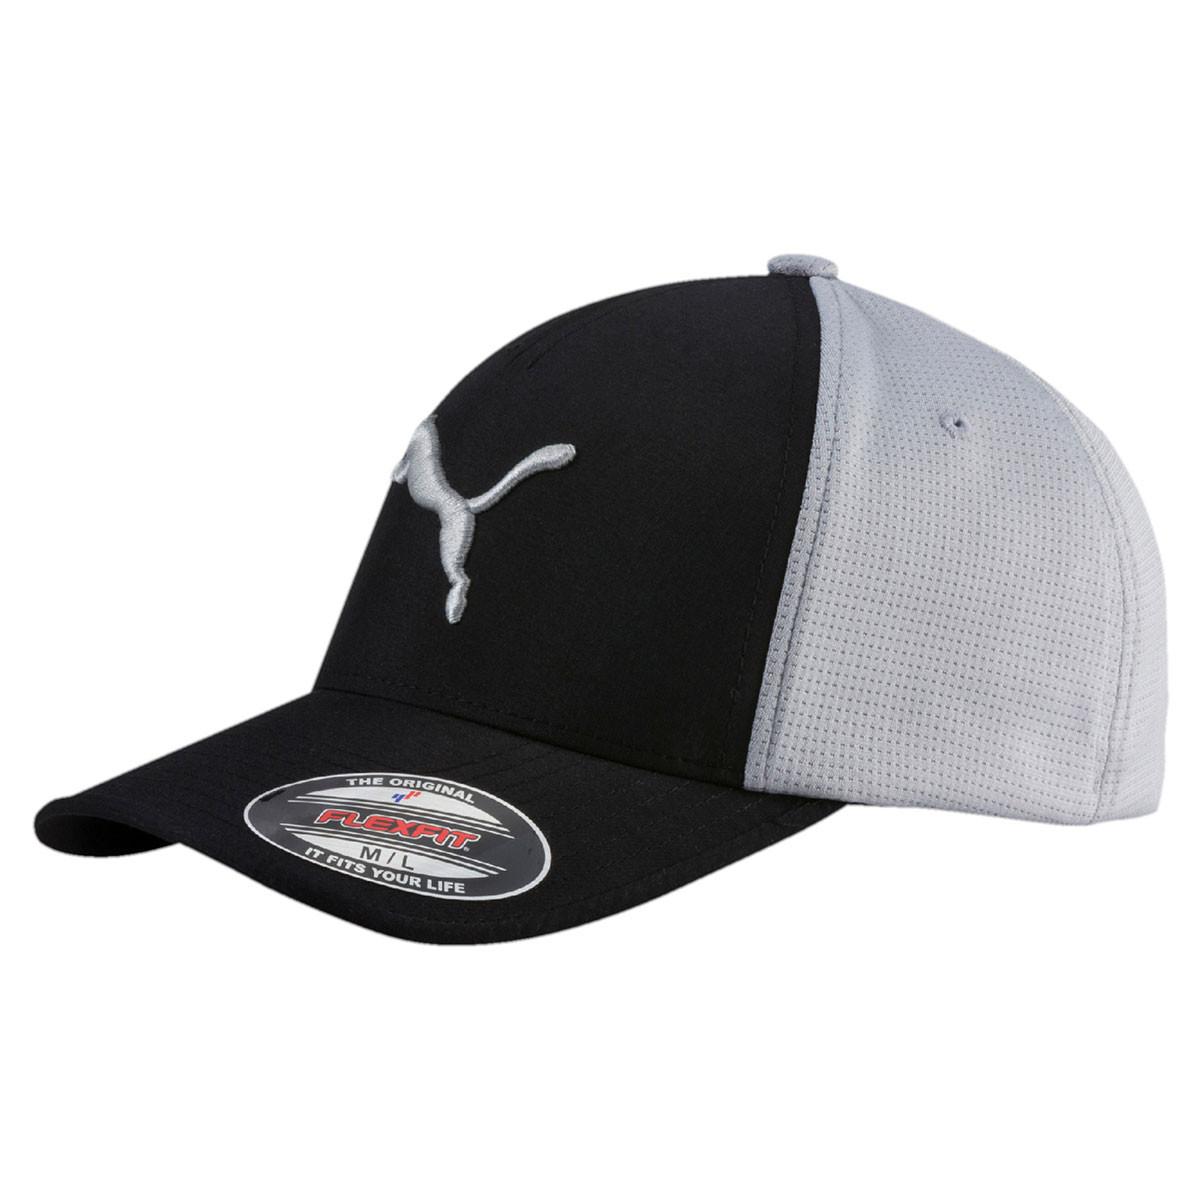 Puma Golf Mens DryCell Flexfit Fitted Cap Moisture-Wicking Sweatband 19b34cd5ddd